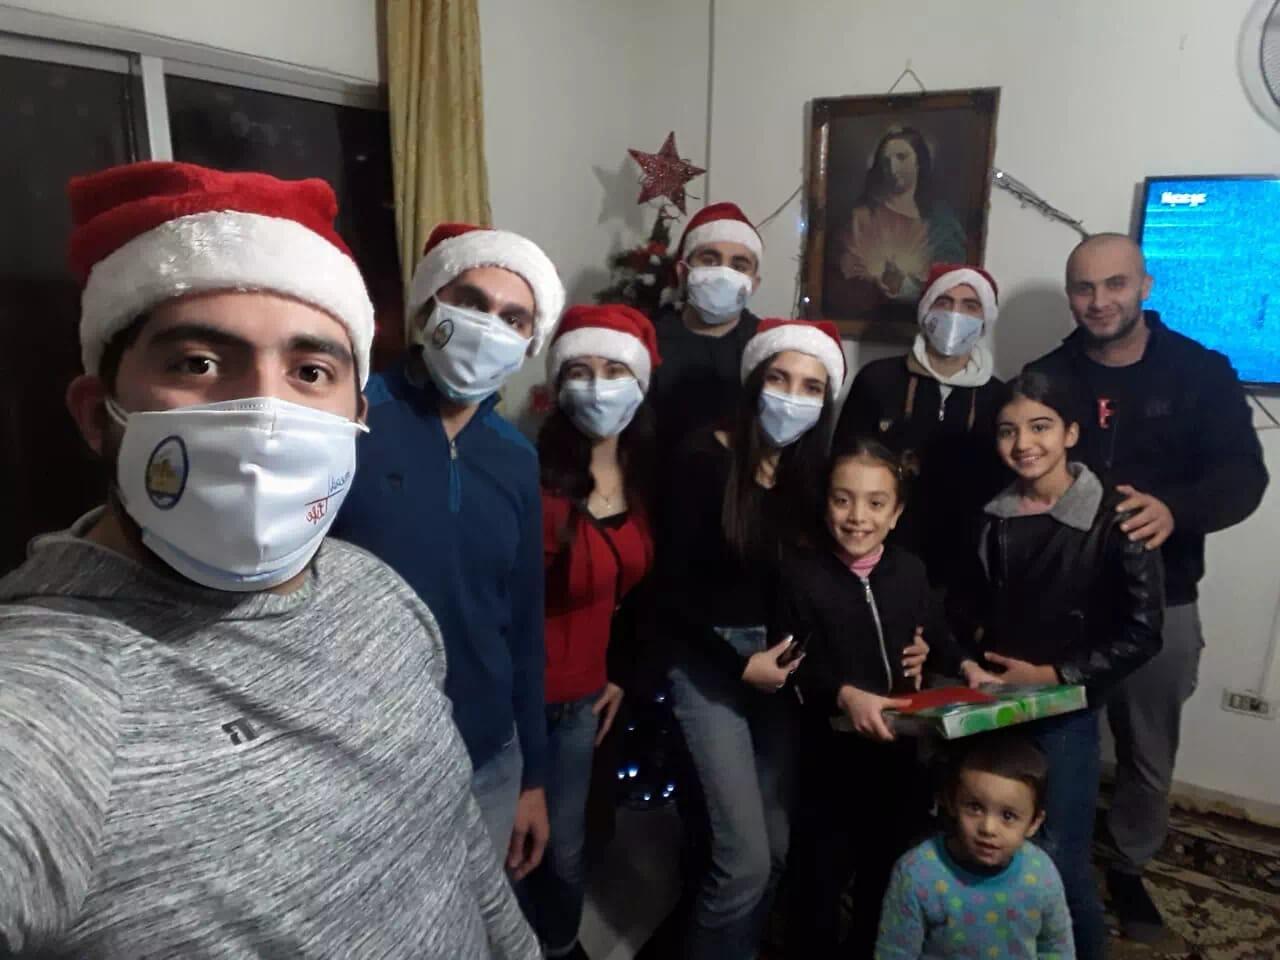 https://eundemia.sirv.com/Images/christmas/456840.webp